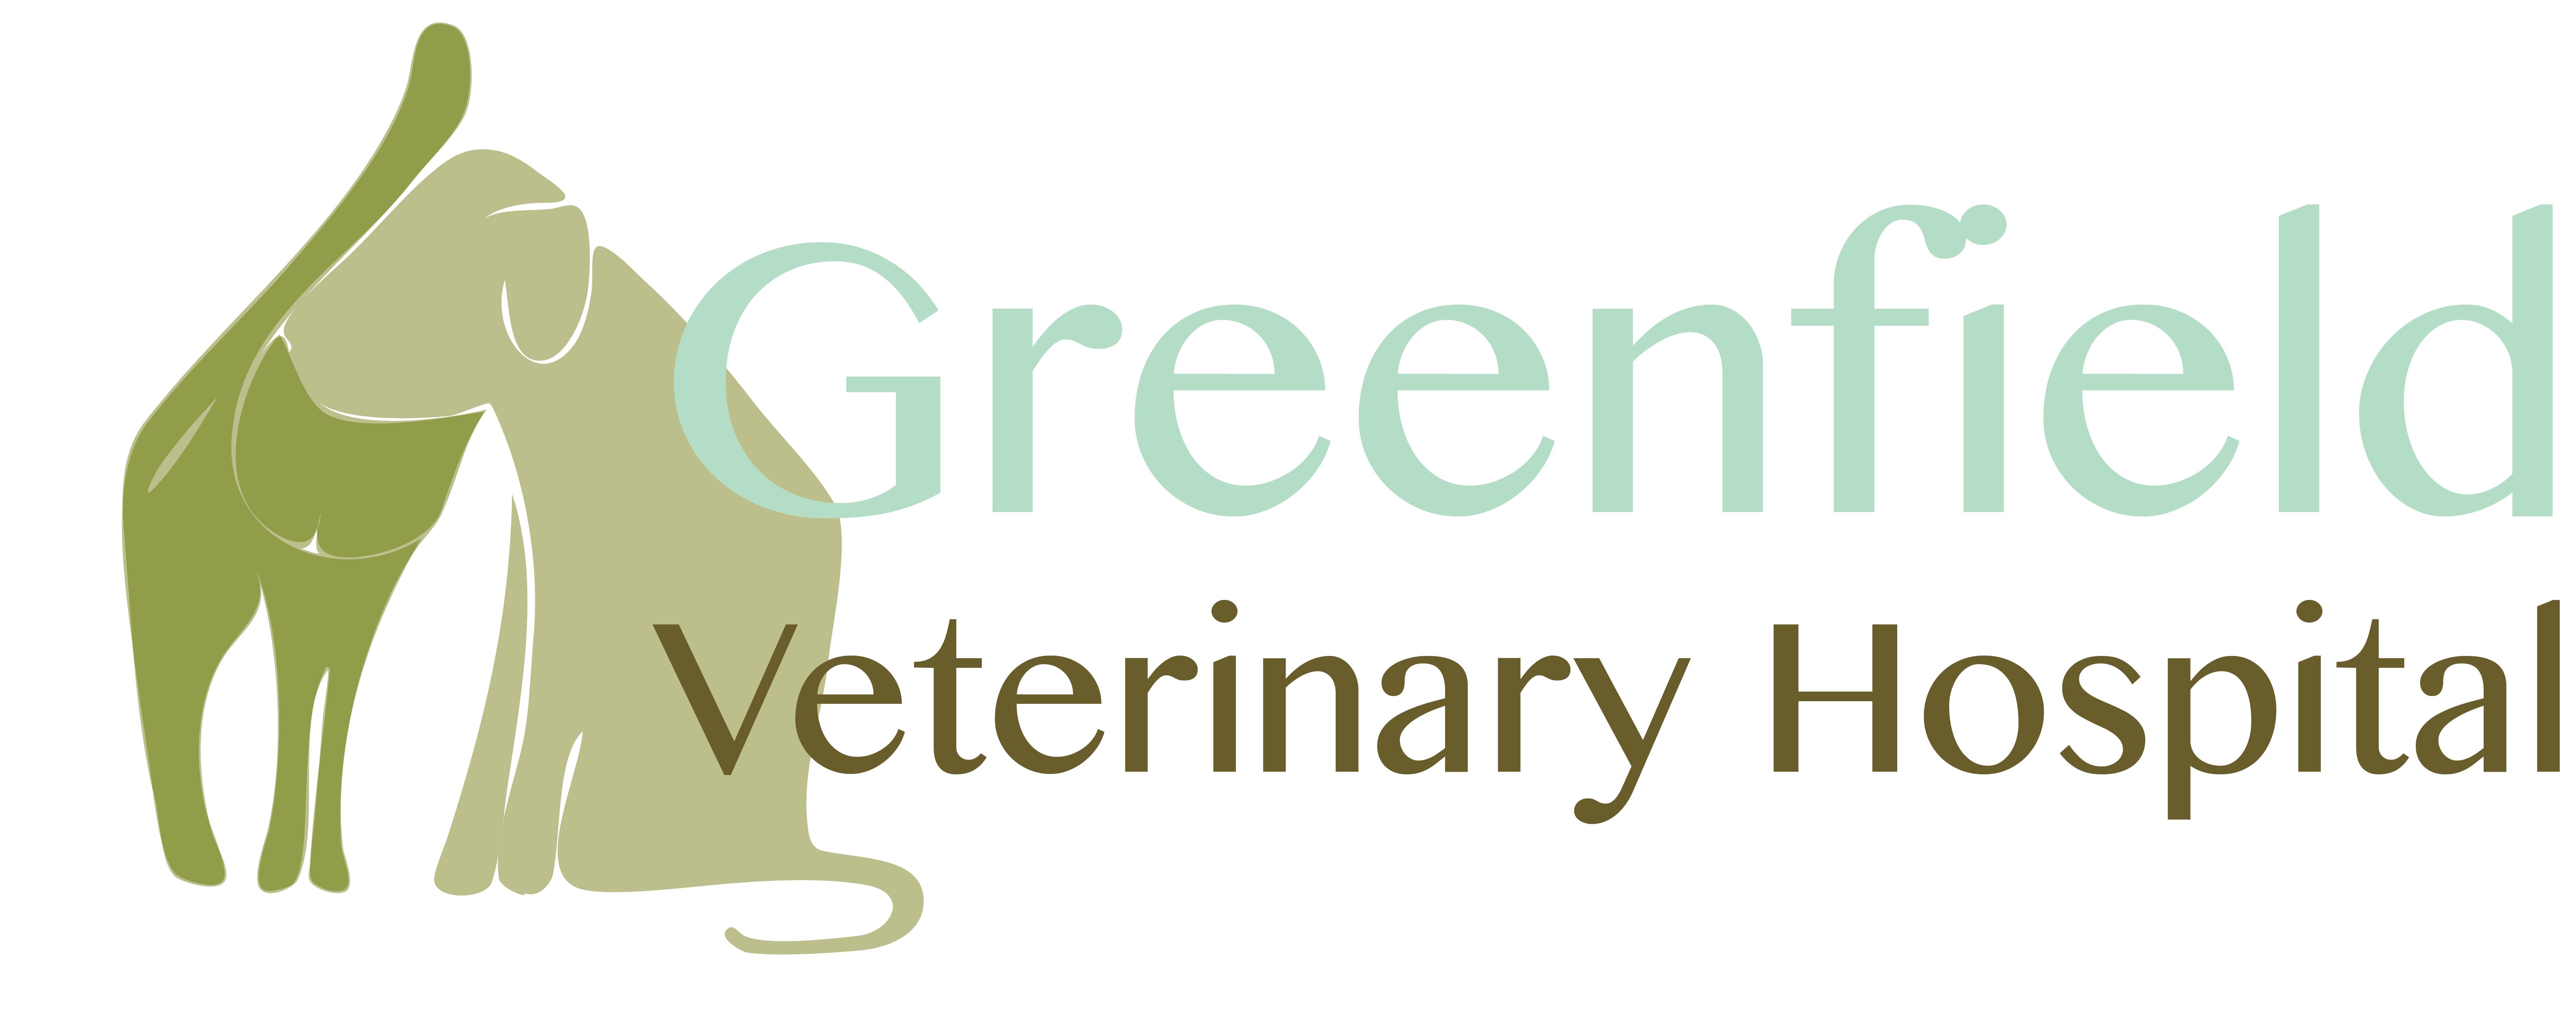 Greenfield Veterinary Hospital